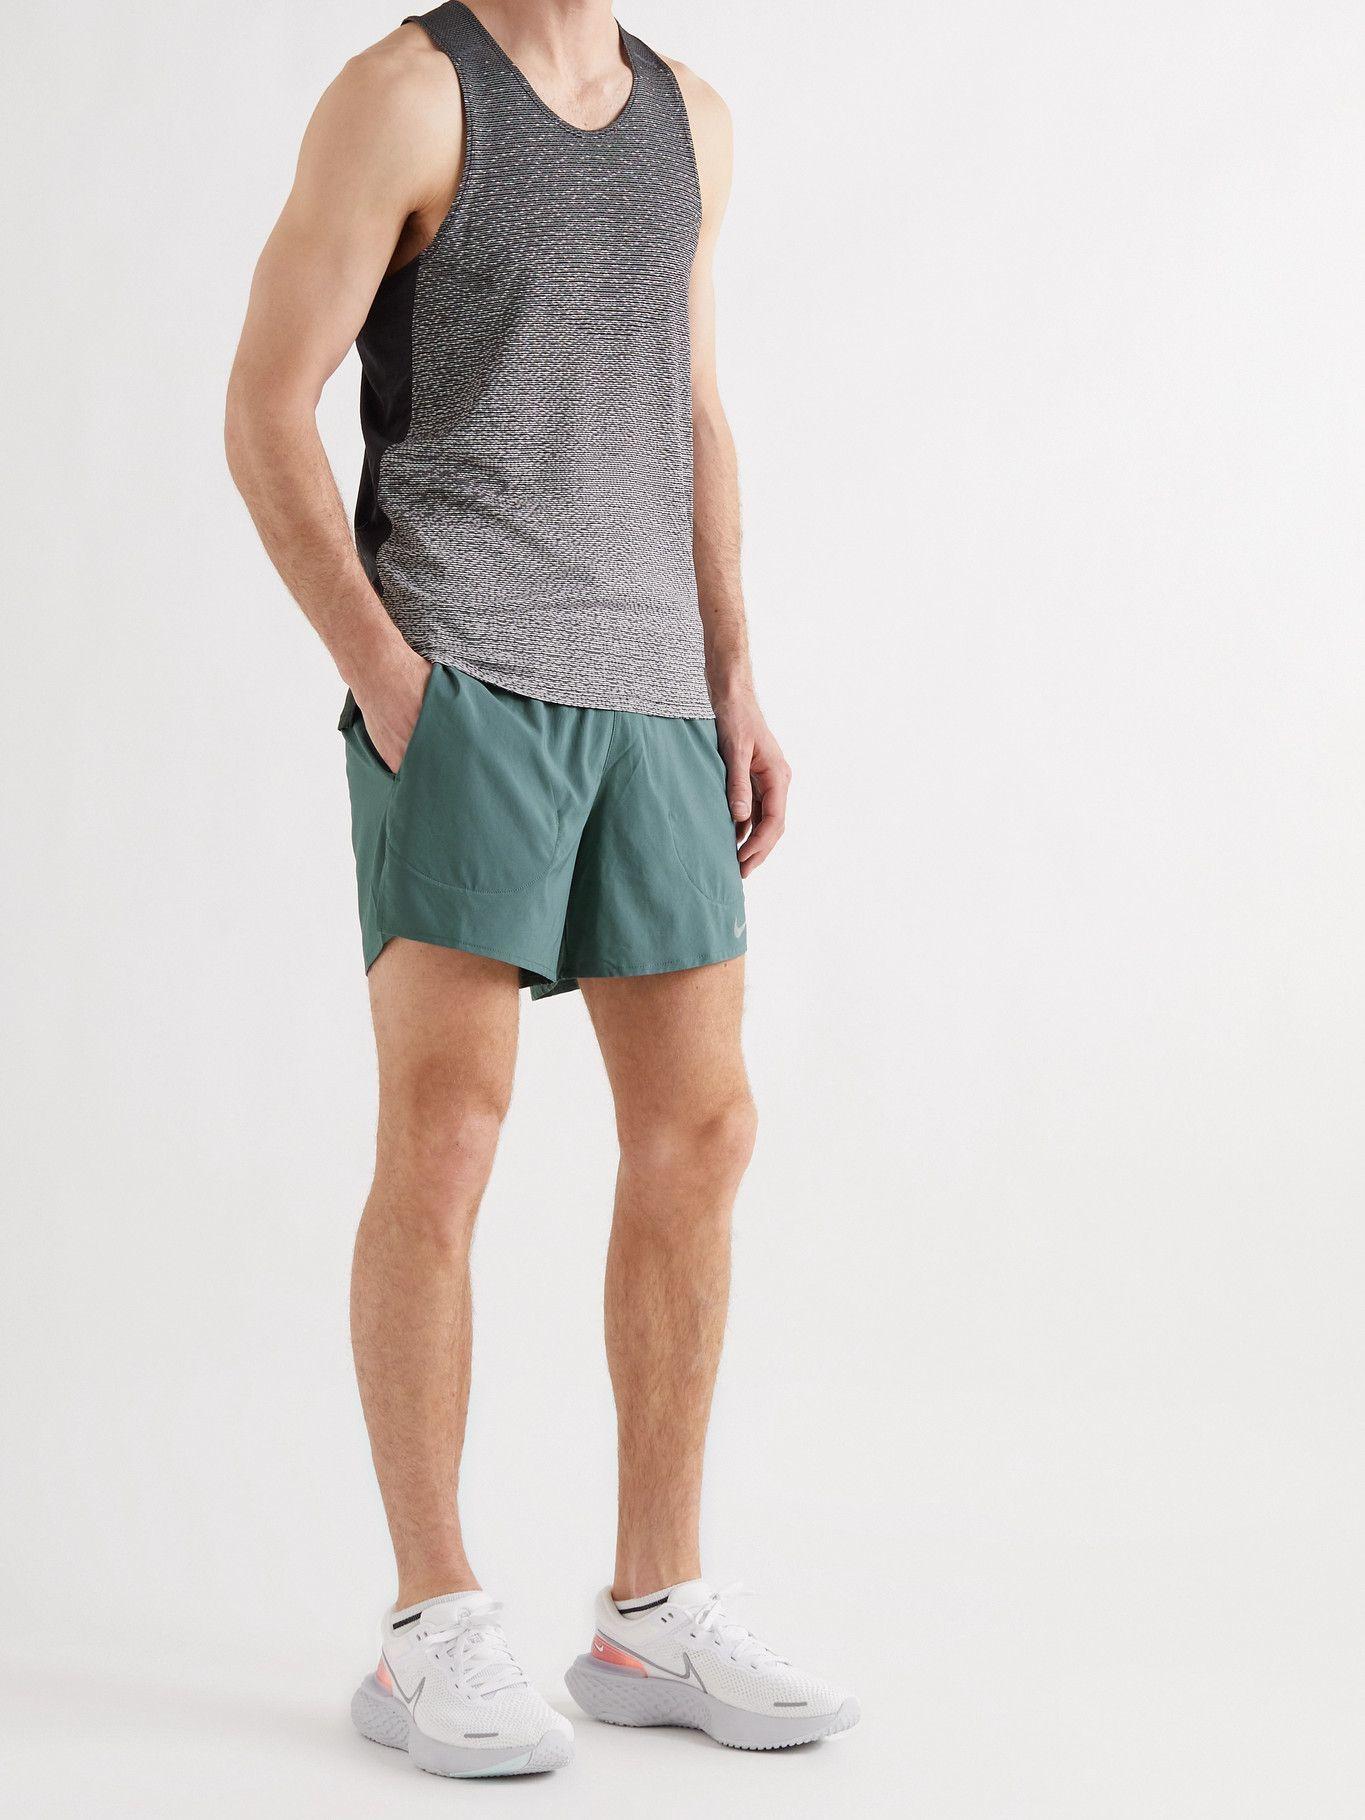 NIKE RUNNING - Flex Stride Dri-FIT Stretch-Shell Shorts - Green